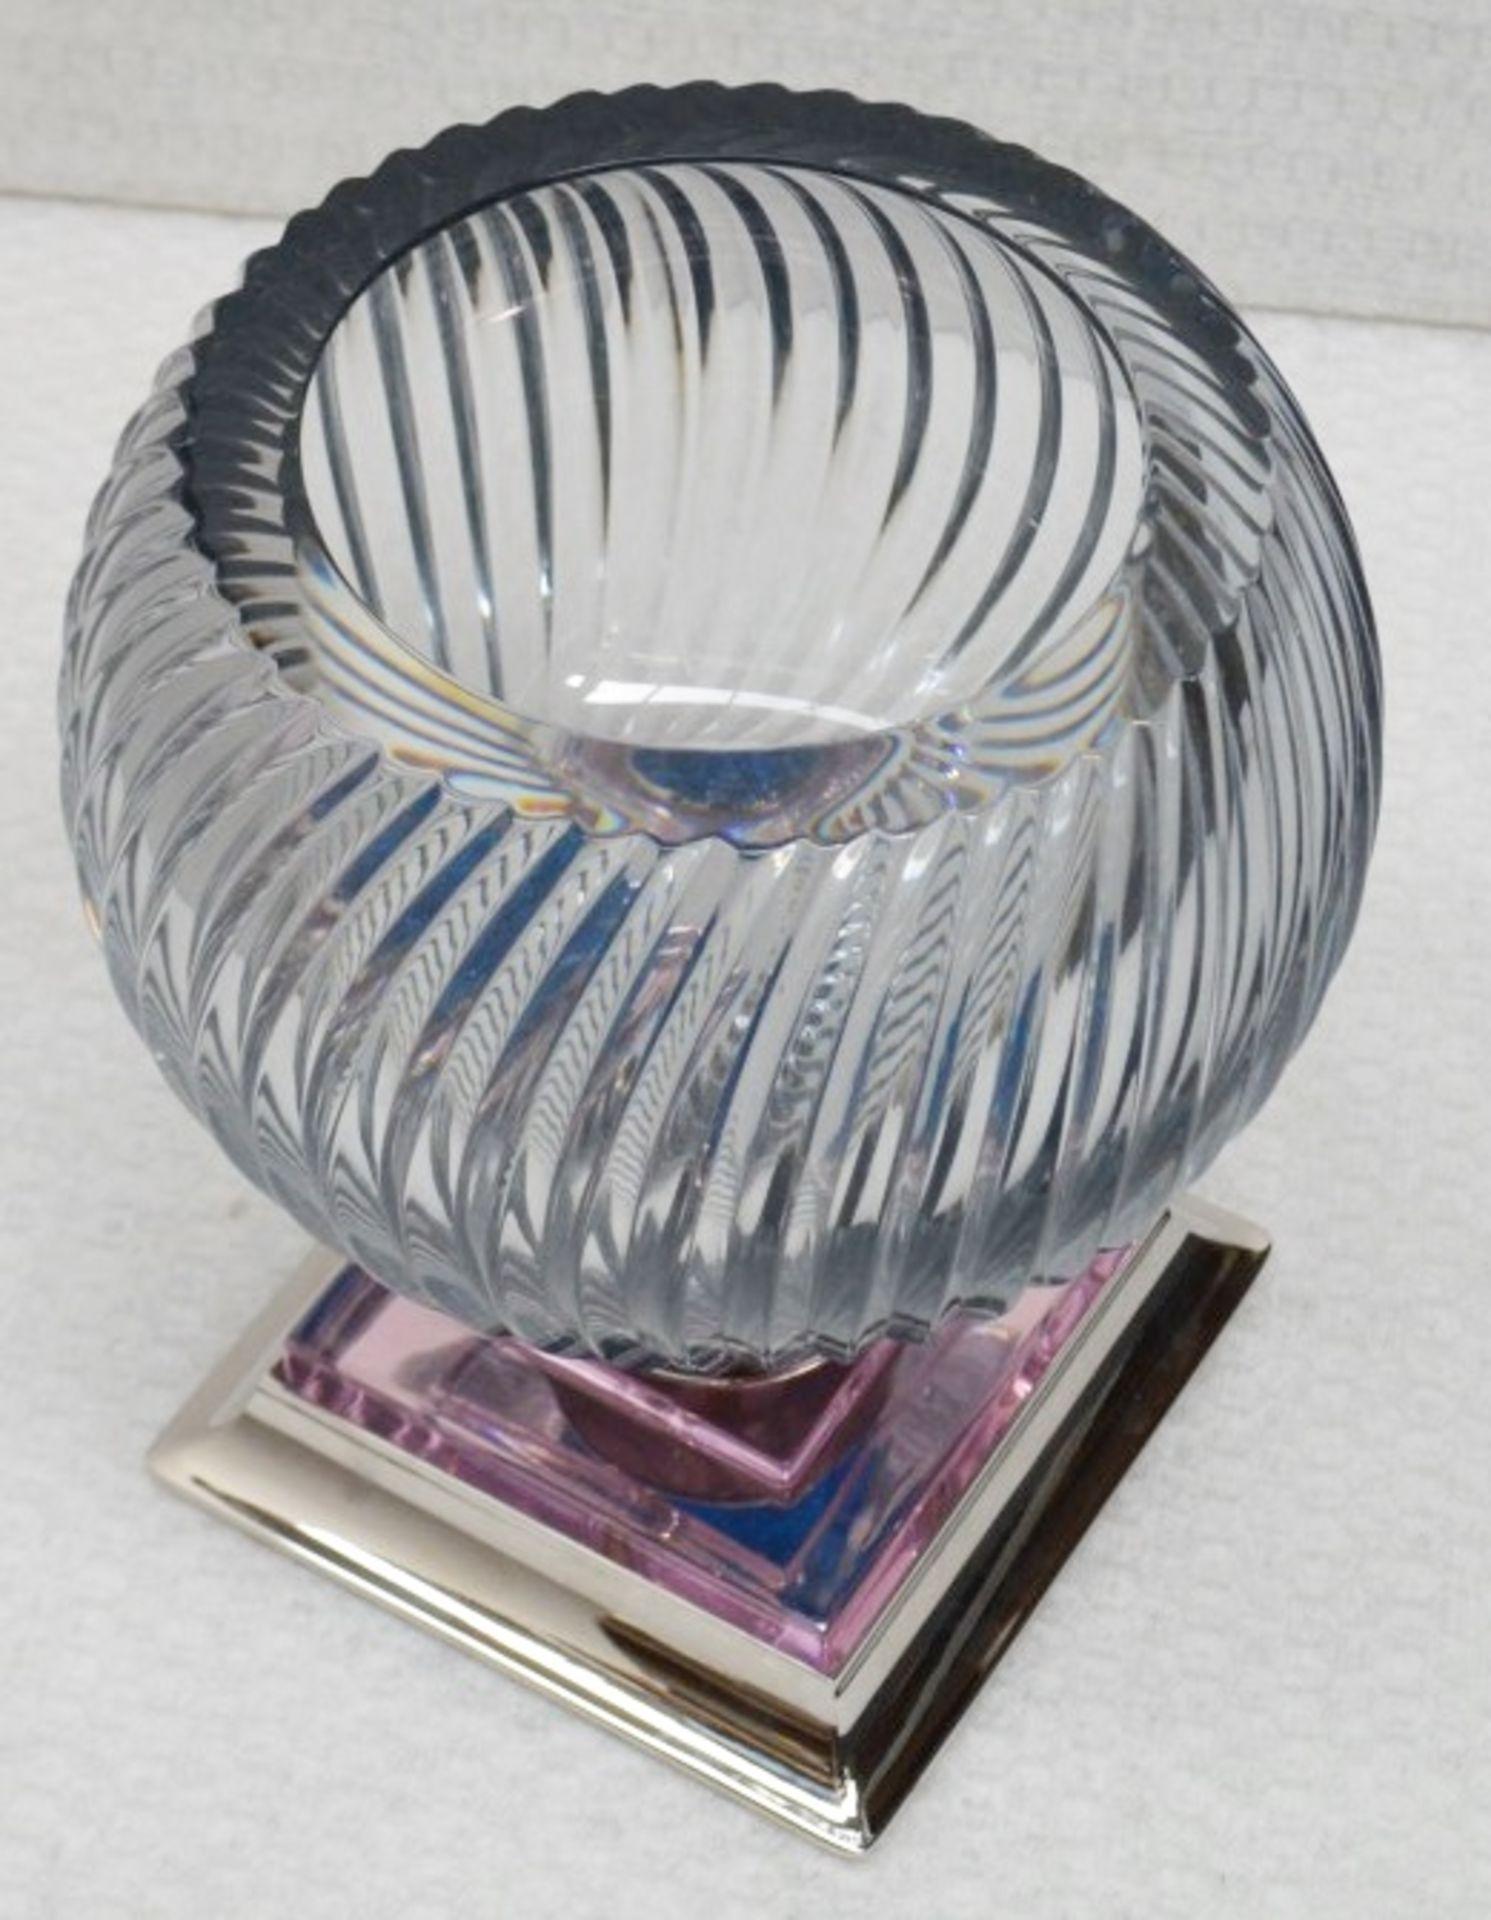 1 x BALDI 'Home Jewels' Italian Hand-crafted Artisan Coccinella 'BIG' Cup, In Smoke, Pink & Blue - Image 3 of 4